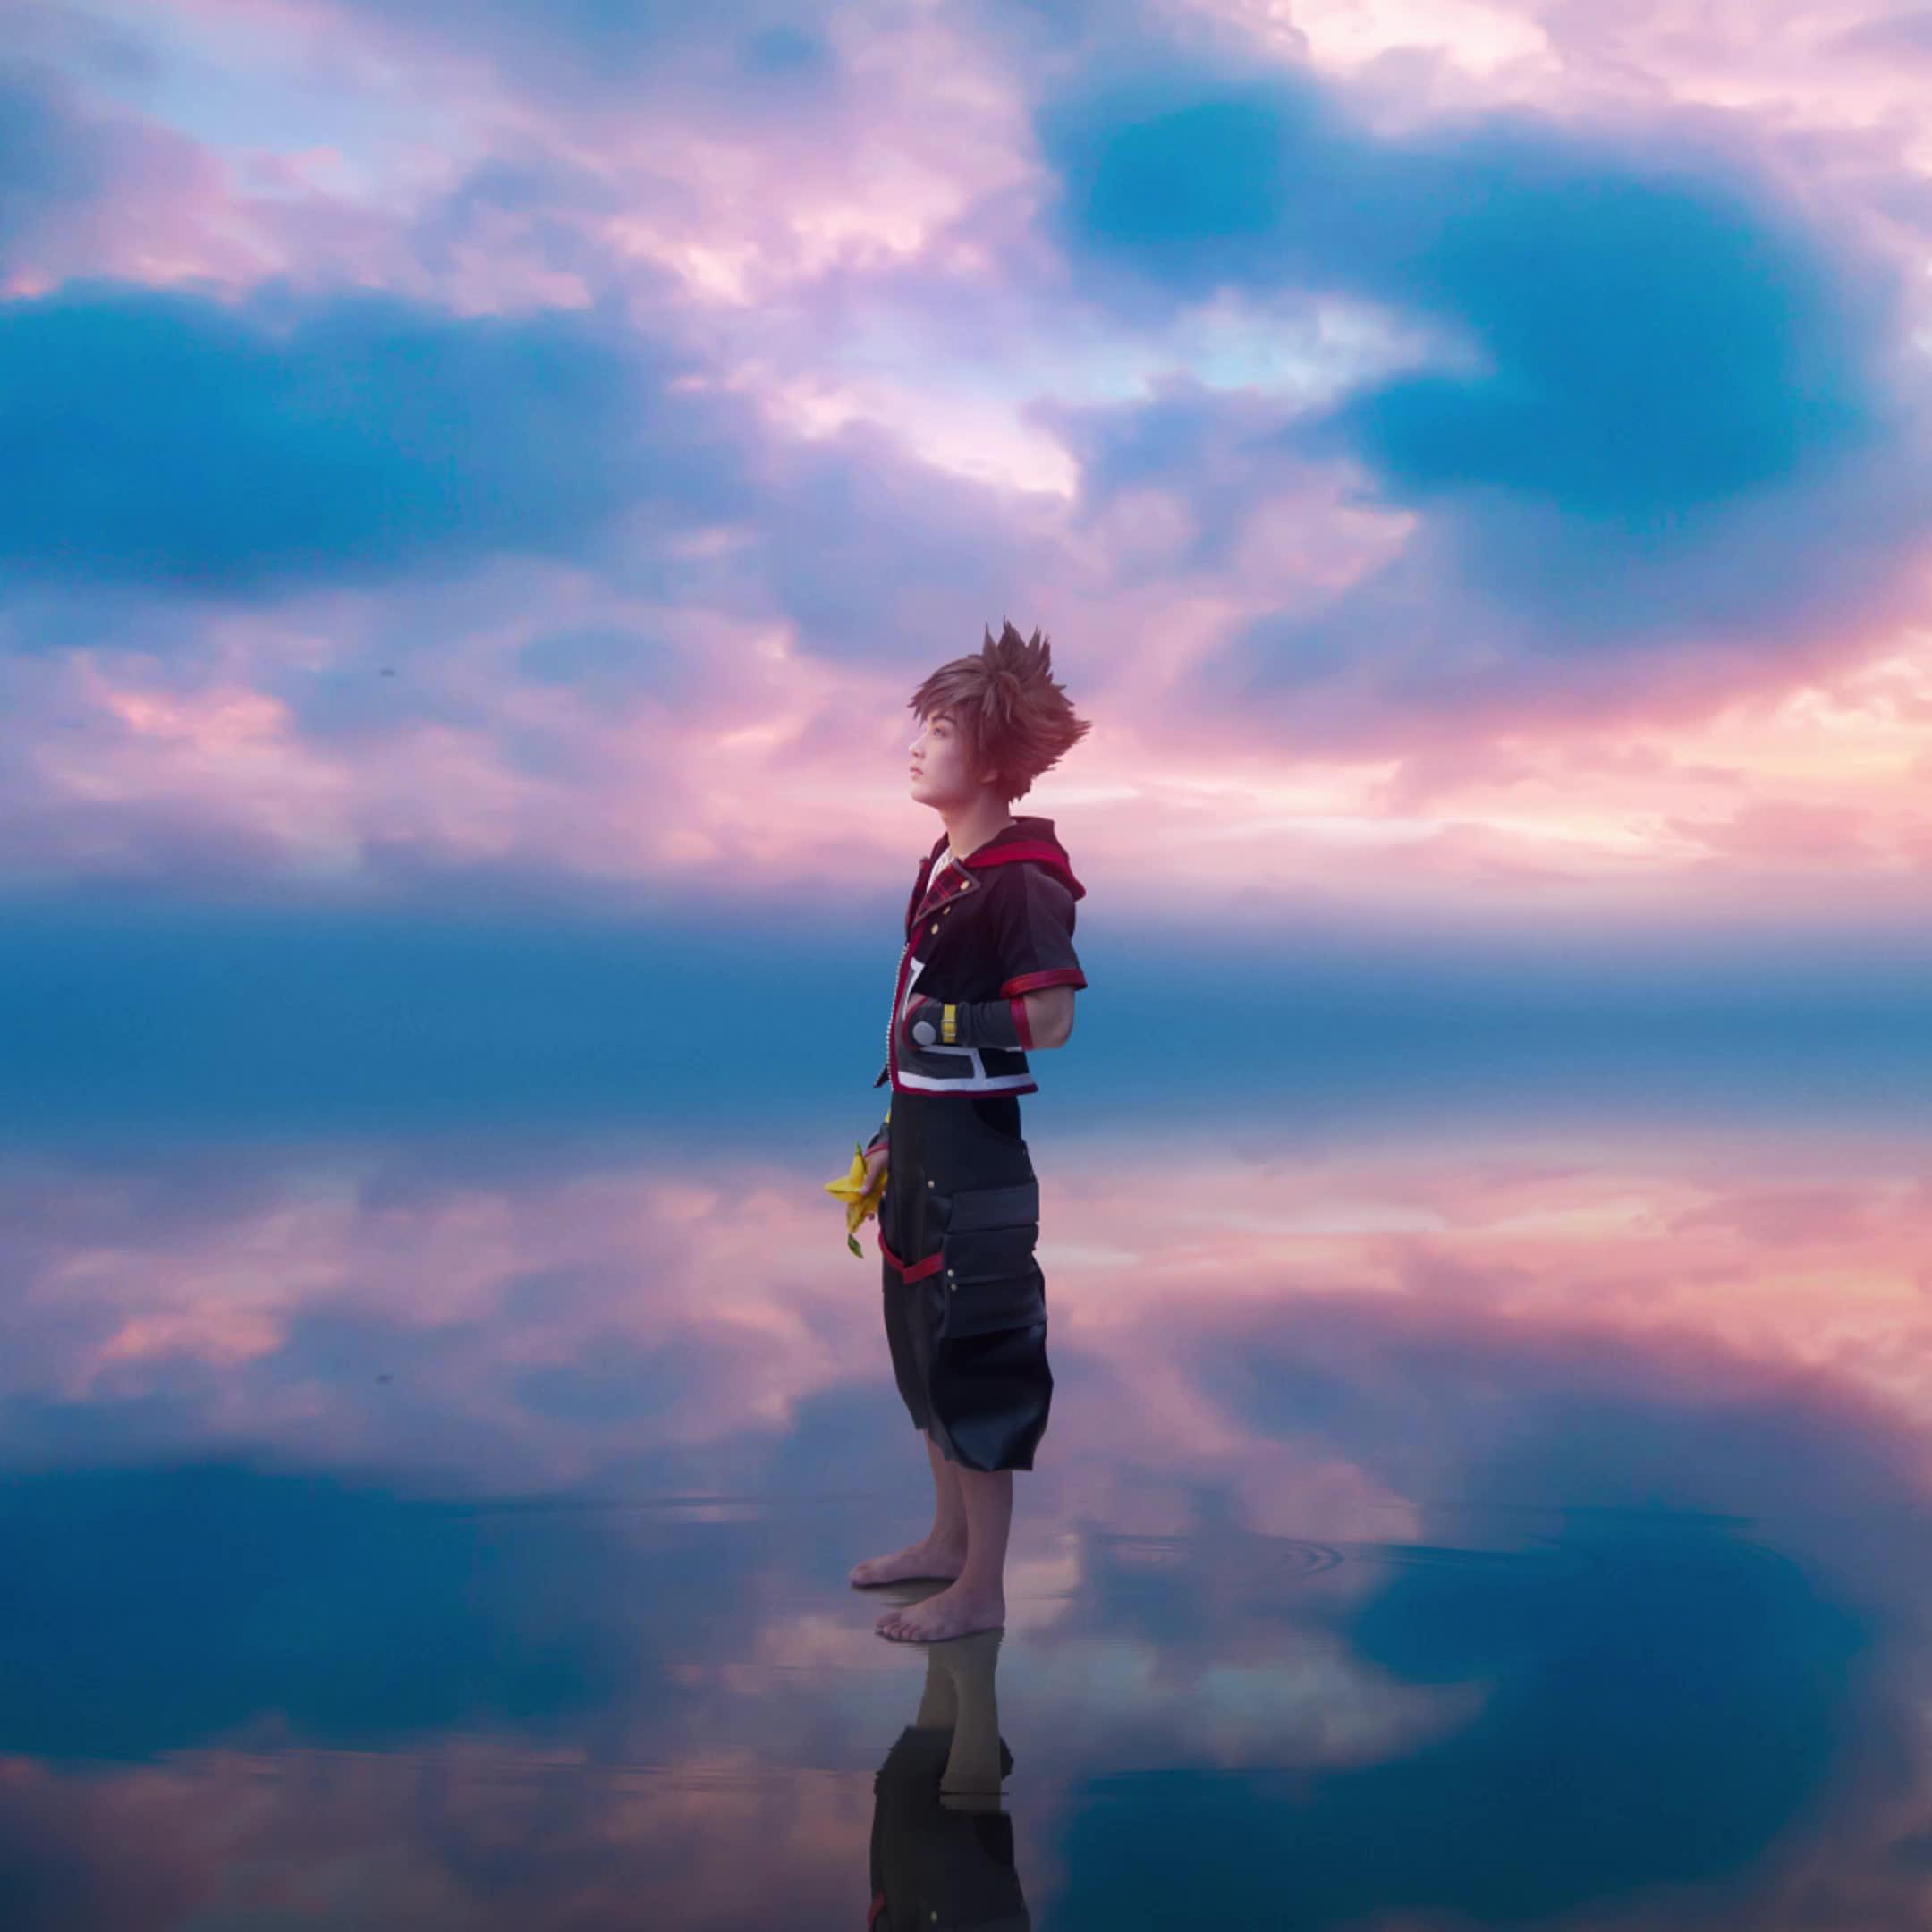 anime, cosplay, disney, kh, kh3, kingdomhearts, kingdomhearts3, sora, squareenix, Kingdom Hearts 3 - Sora Cosplay Photomotion ft. MrDustinn GIFs